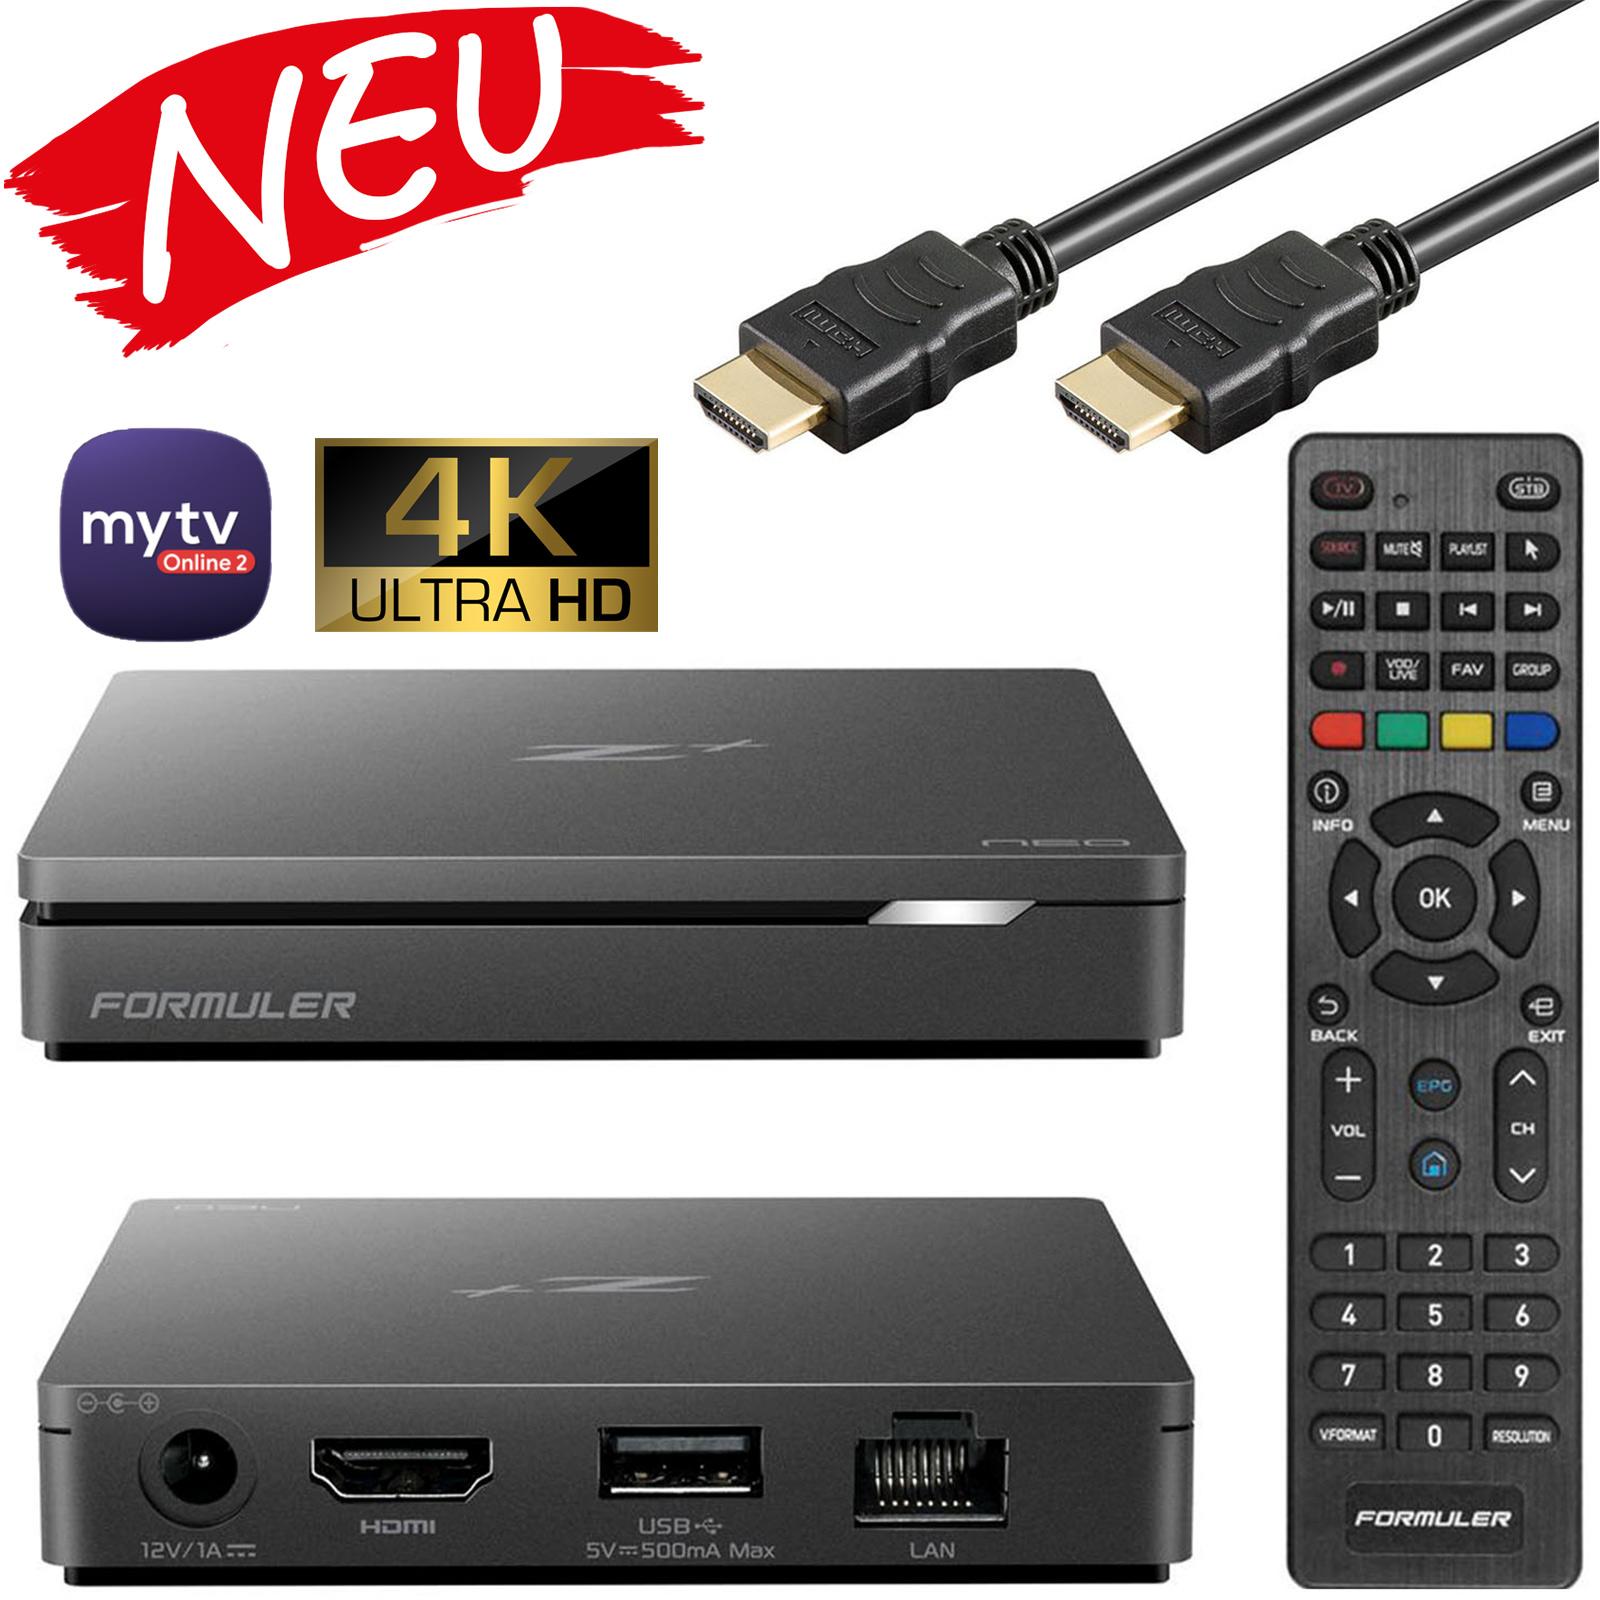 Formuler Z+ Neo 5G IPTV Box Android 7 Media Player TV IP Receiver, H.265 HEVC Kodi WIFI Stalker inkl. HDMI Kabel